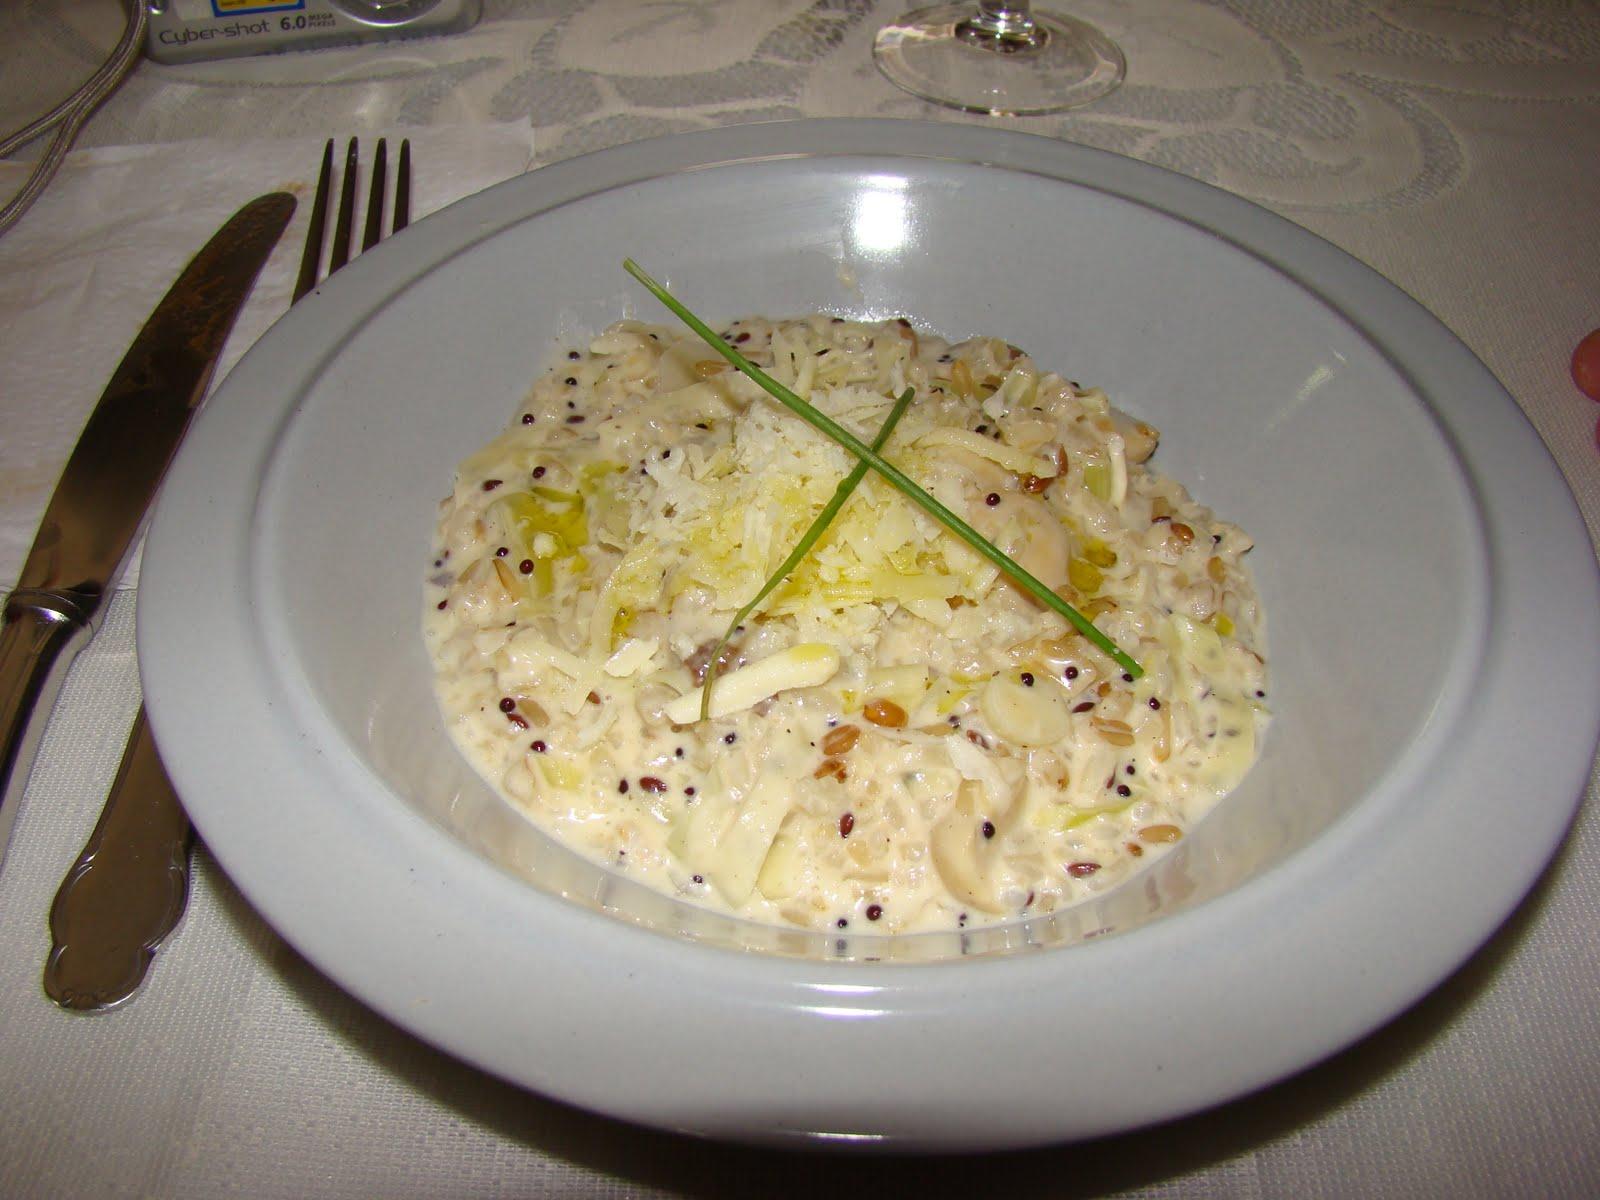 Comidas rumos risotto de arroz r ris - Risotto arroz integral ...